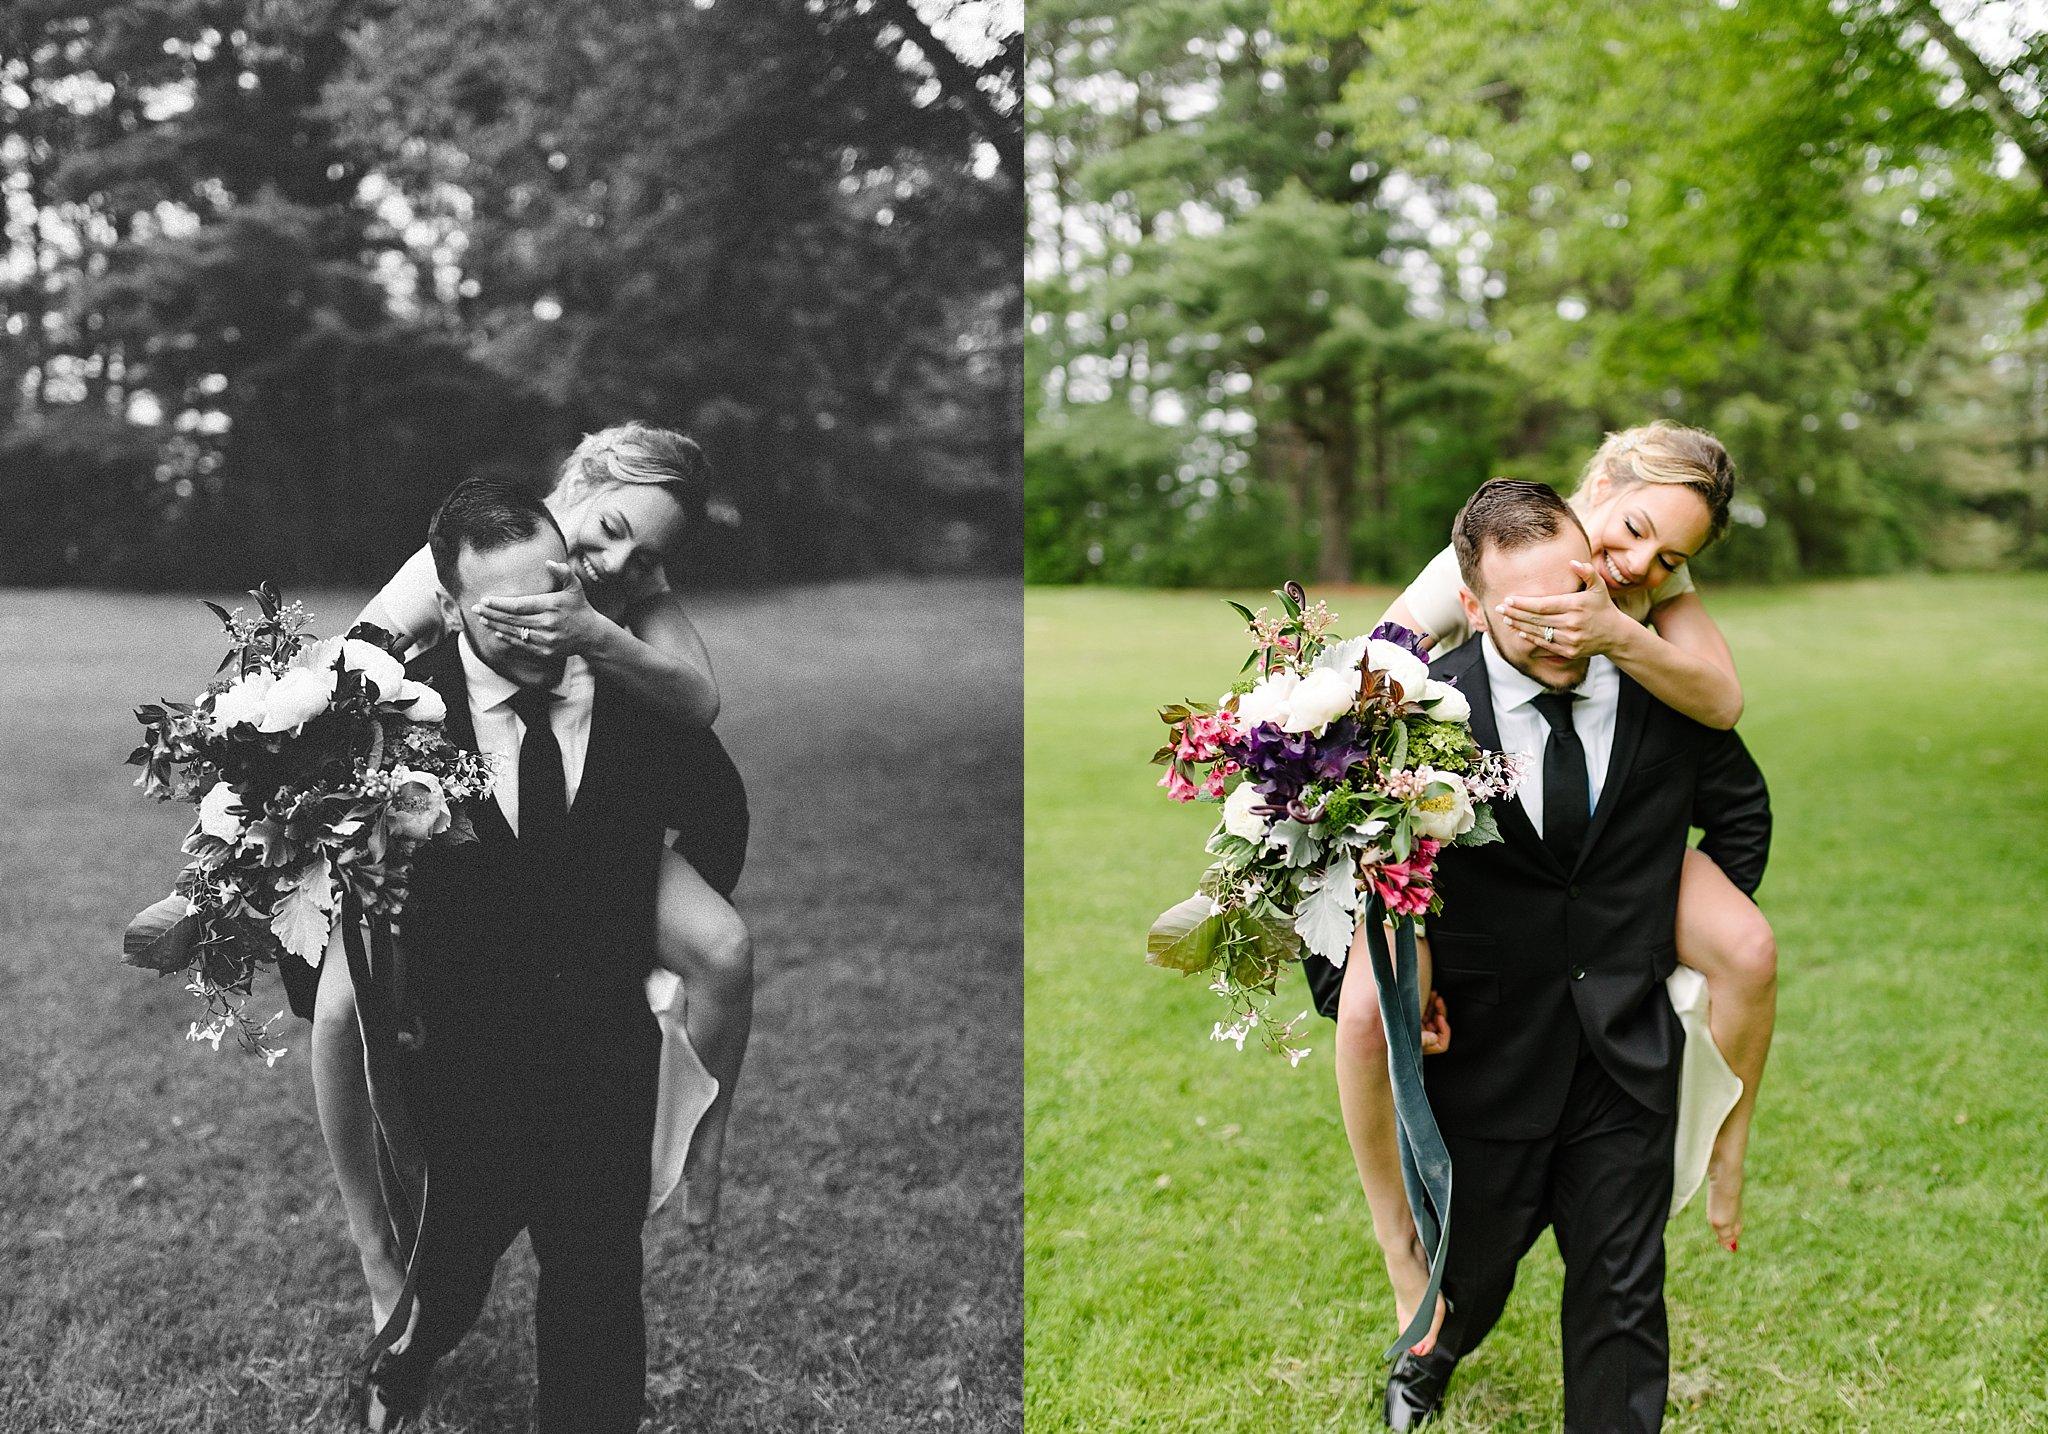 fun wedding photograph ideas in new england.jpg